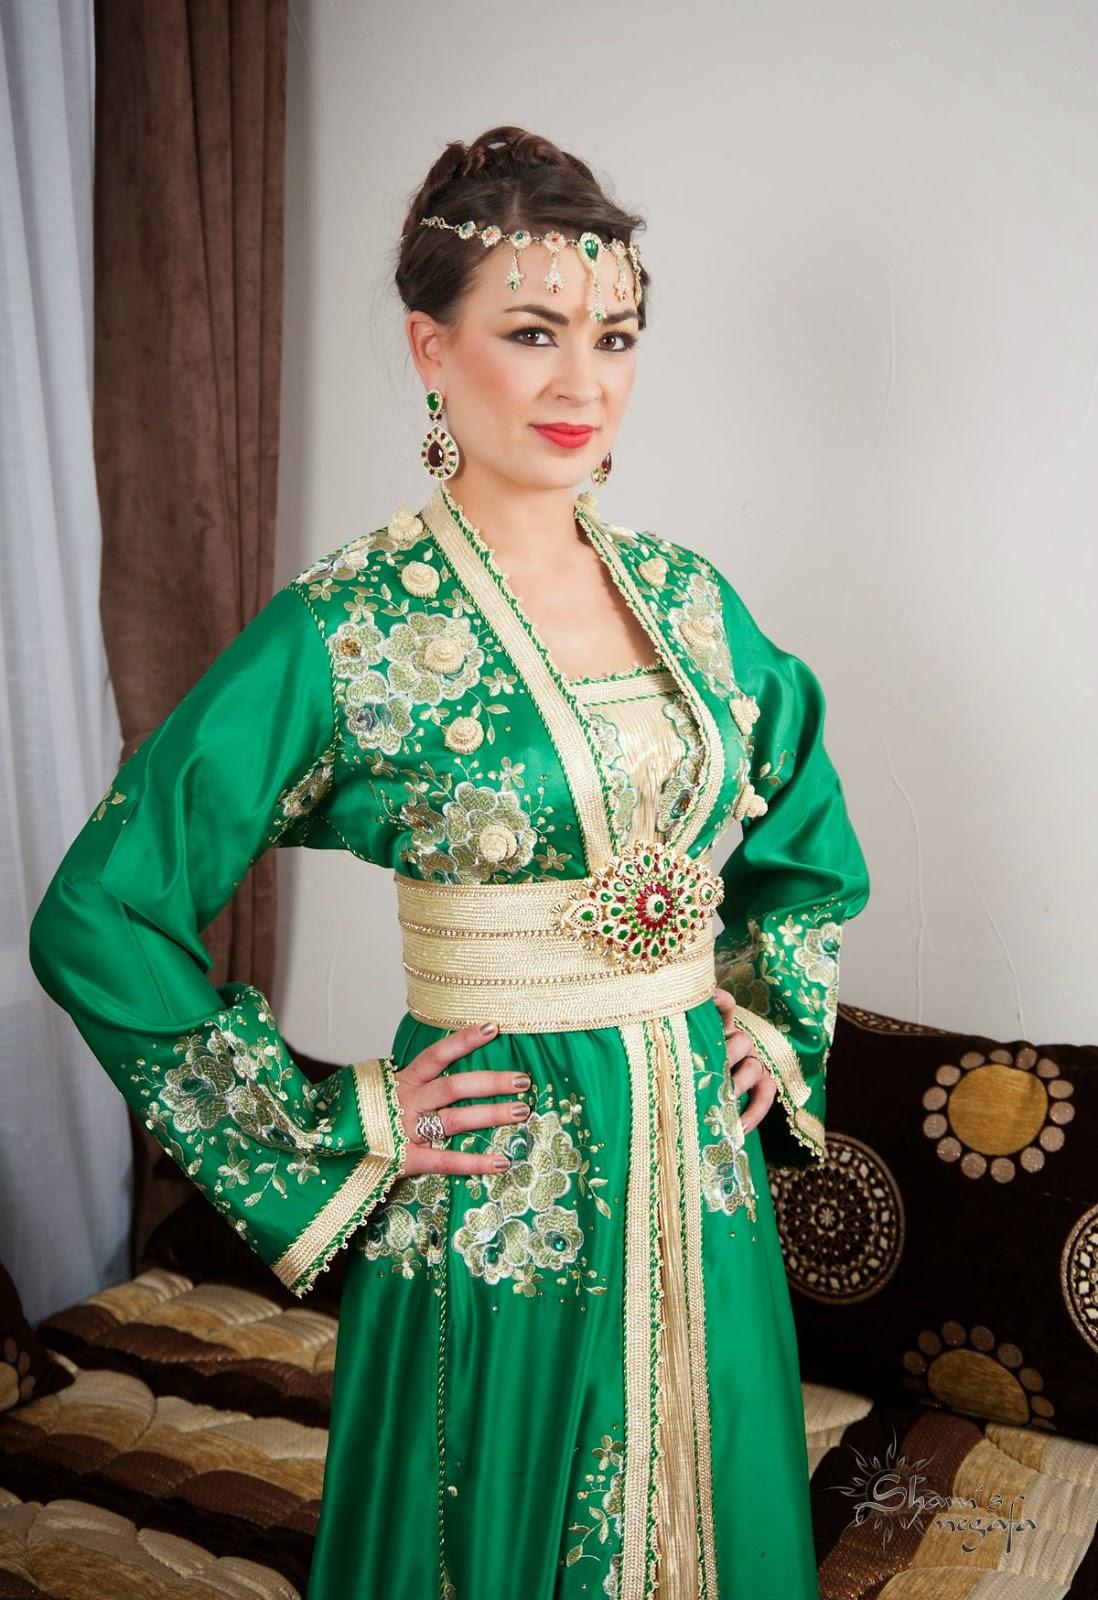 Caftan 2016 Vert Haute Couture - Caftan Marocain